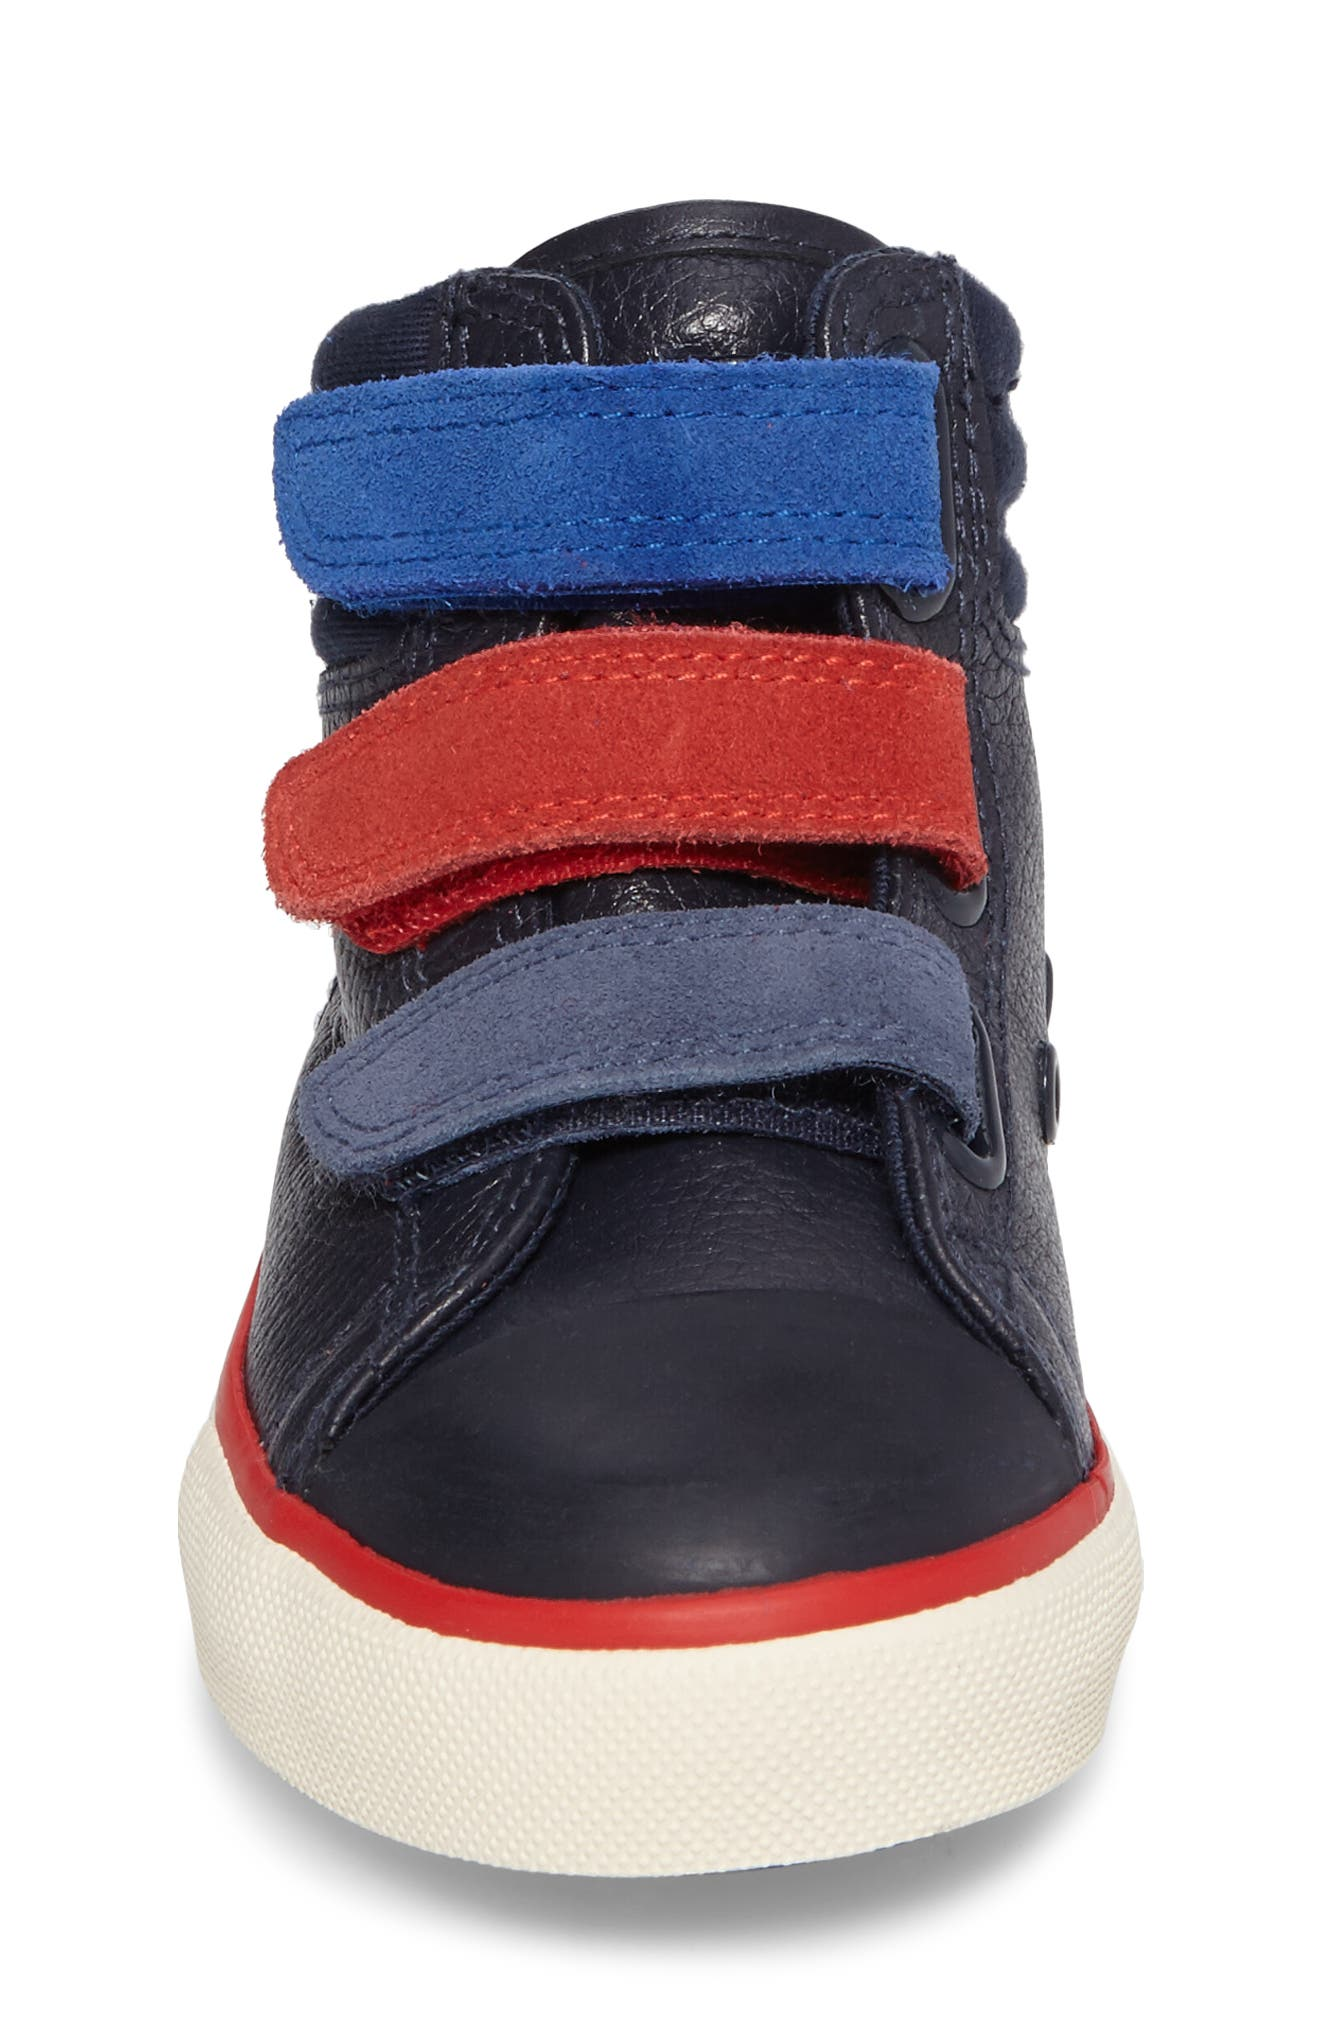 High Top Sneaker,                             Alternate thumbnail 4, color,                             Navy